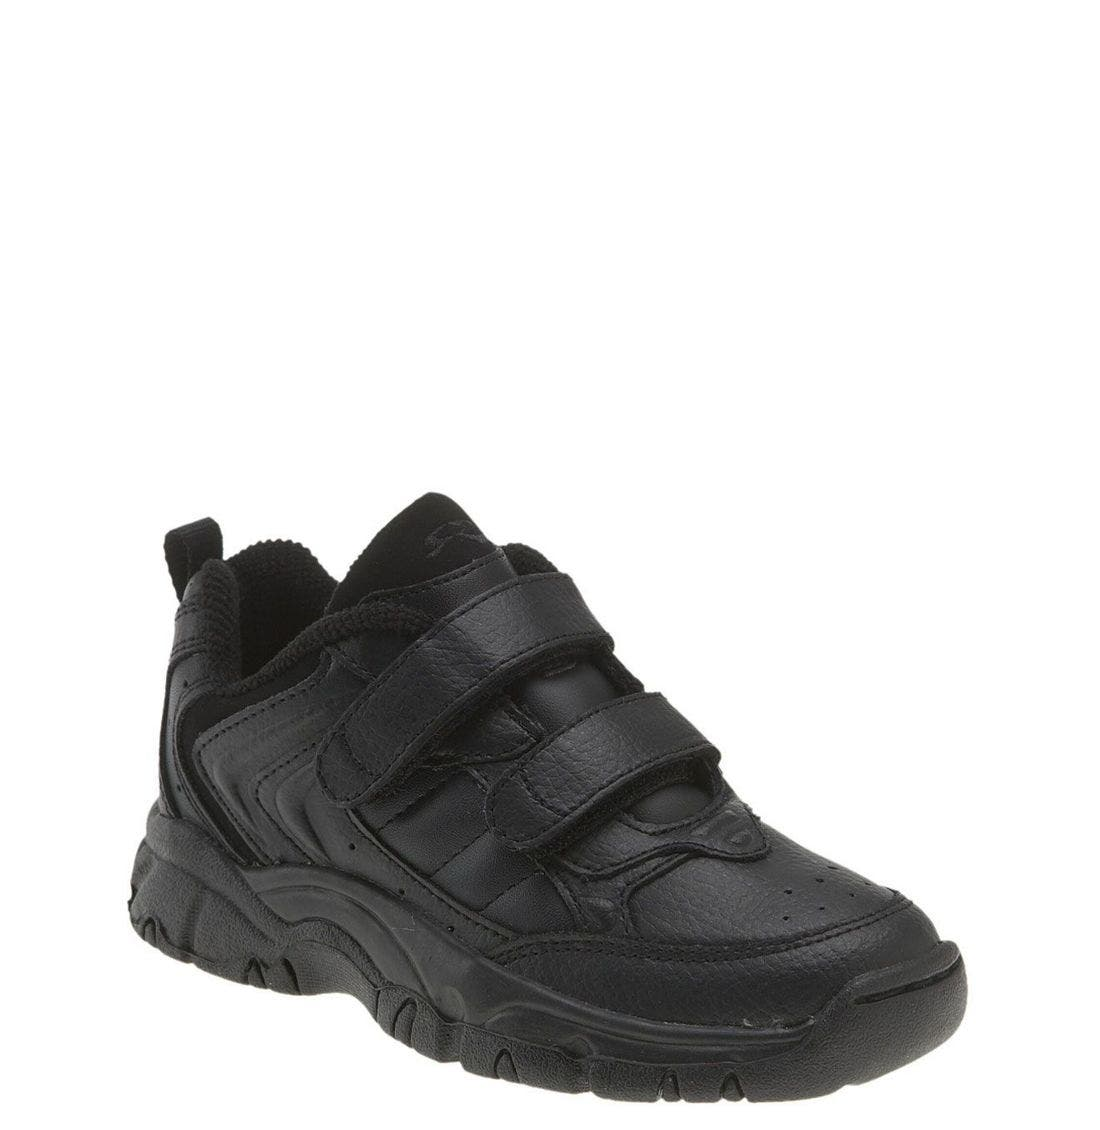 Alternate Image 1 Selected - Stride Rite 'Austin H&L' Sneaker (Toddler, Little Kid & Big Kid)